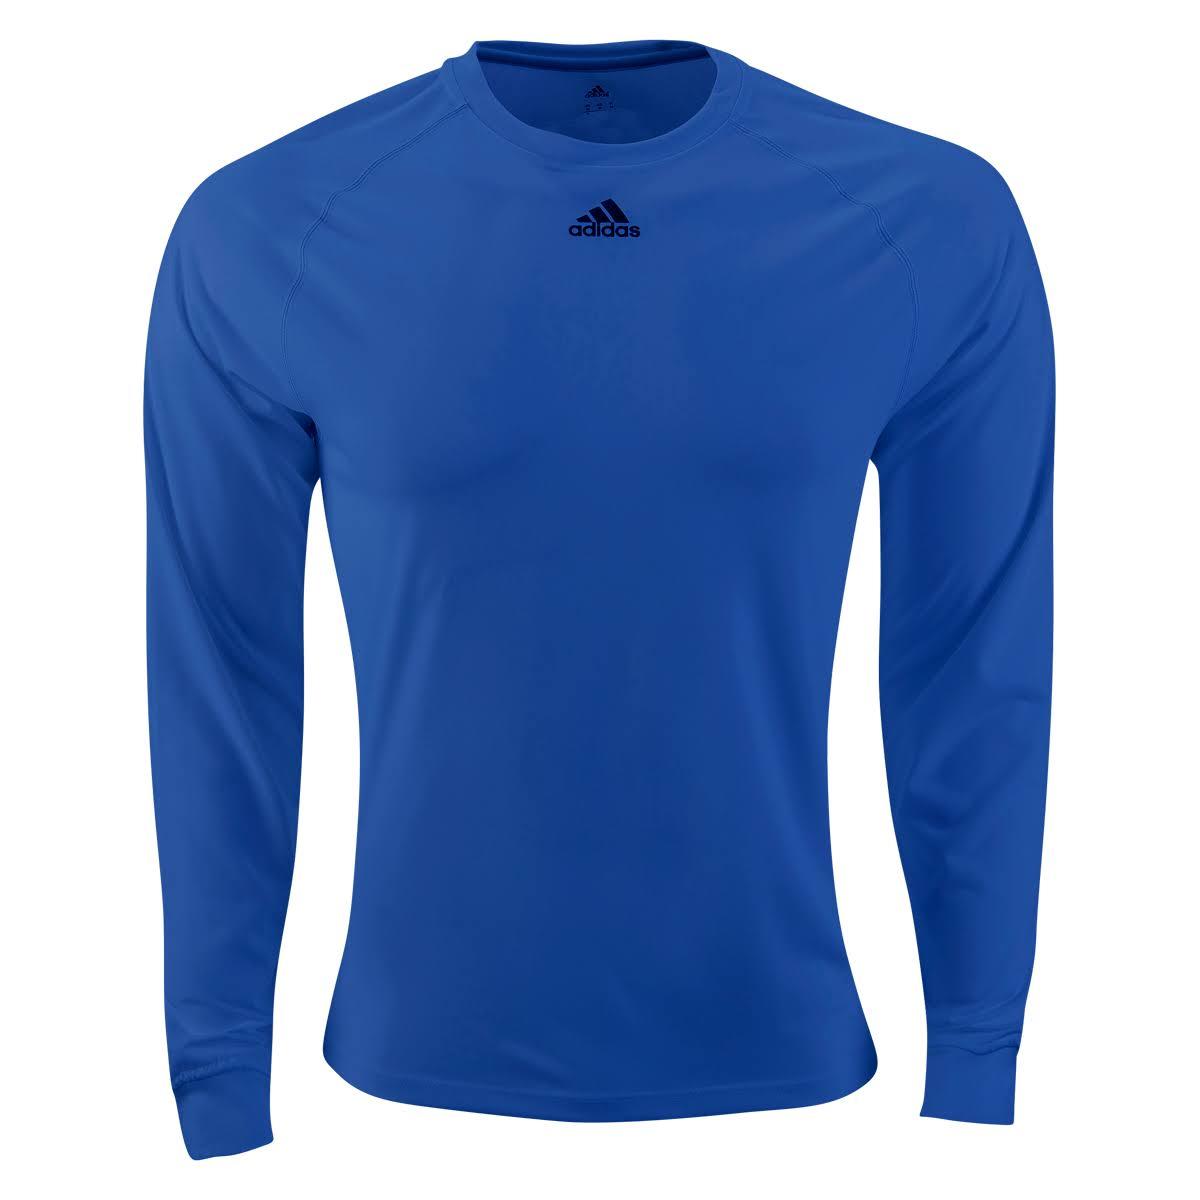 Climalite Adidas Hombre Tamaño 4xl Camiseta Larga Team 2946cly De Manga CYtXq